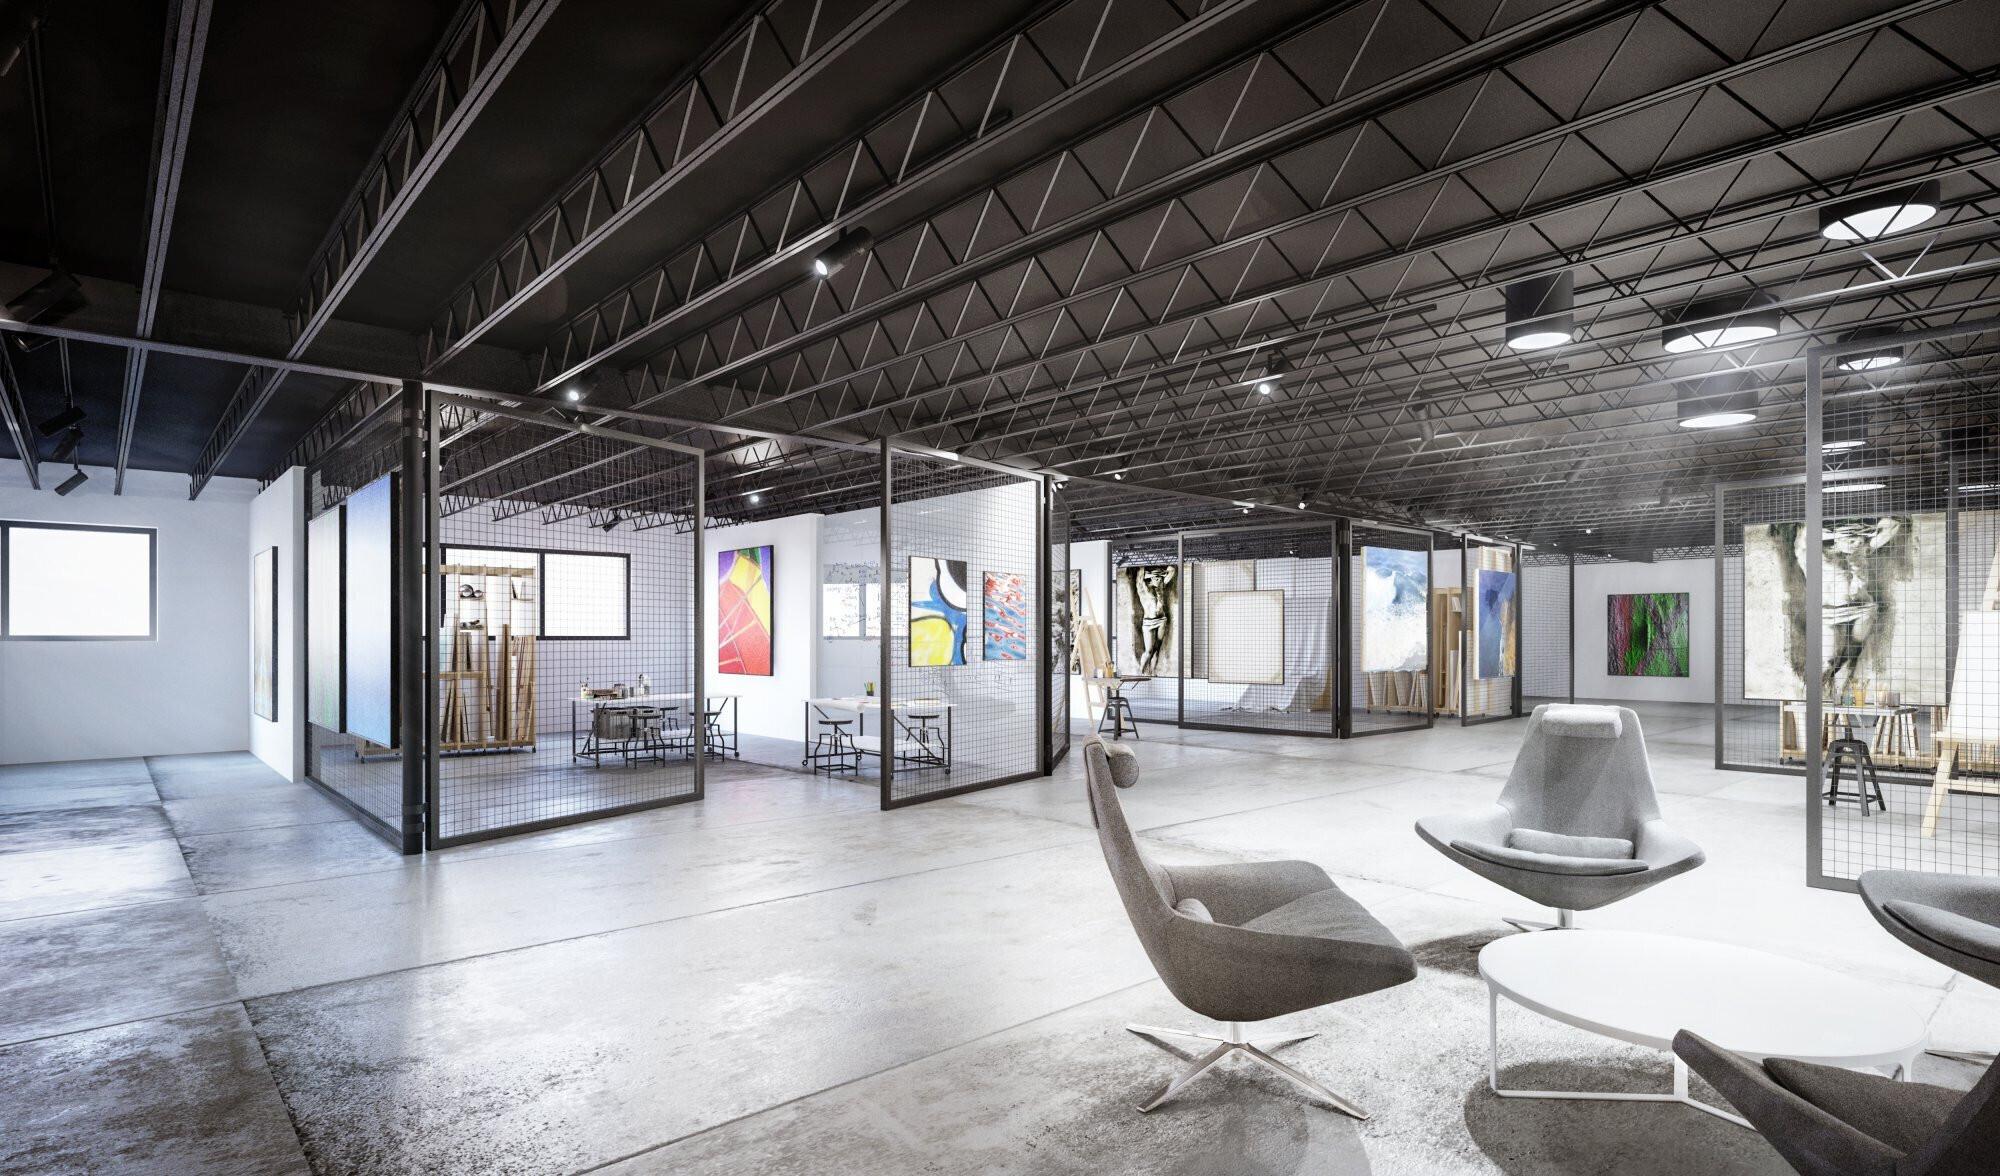 louisville-visual-arts-studios